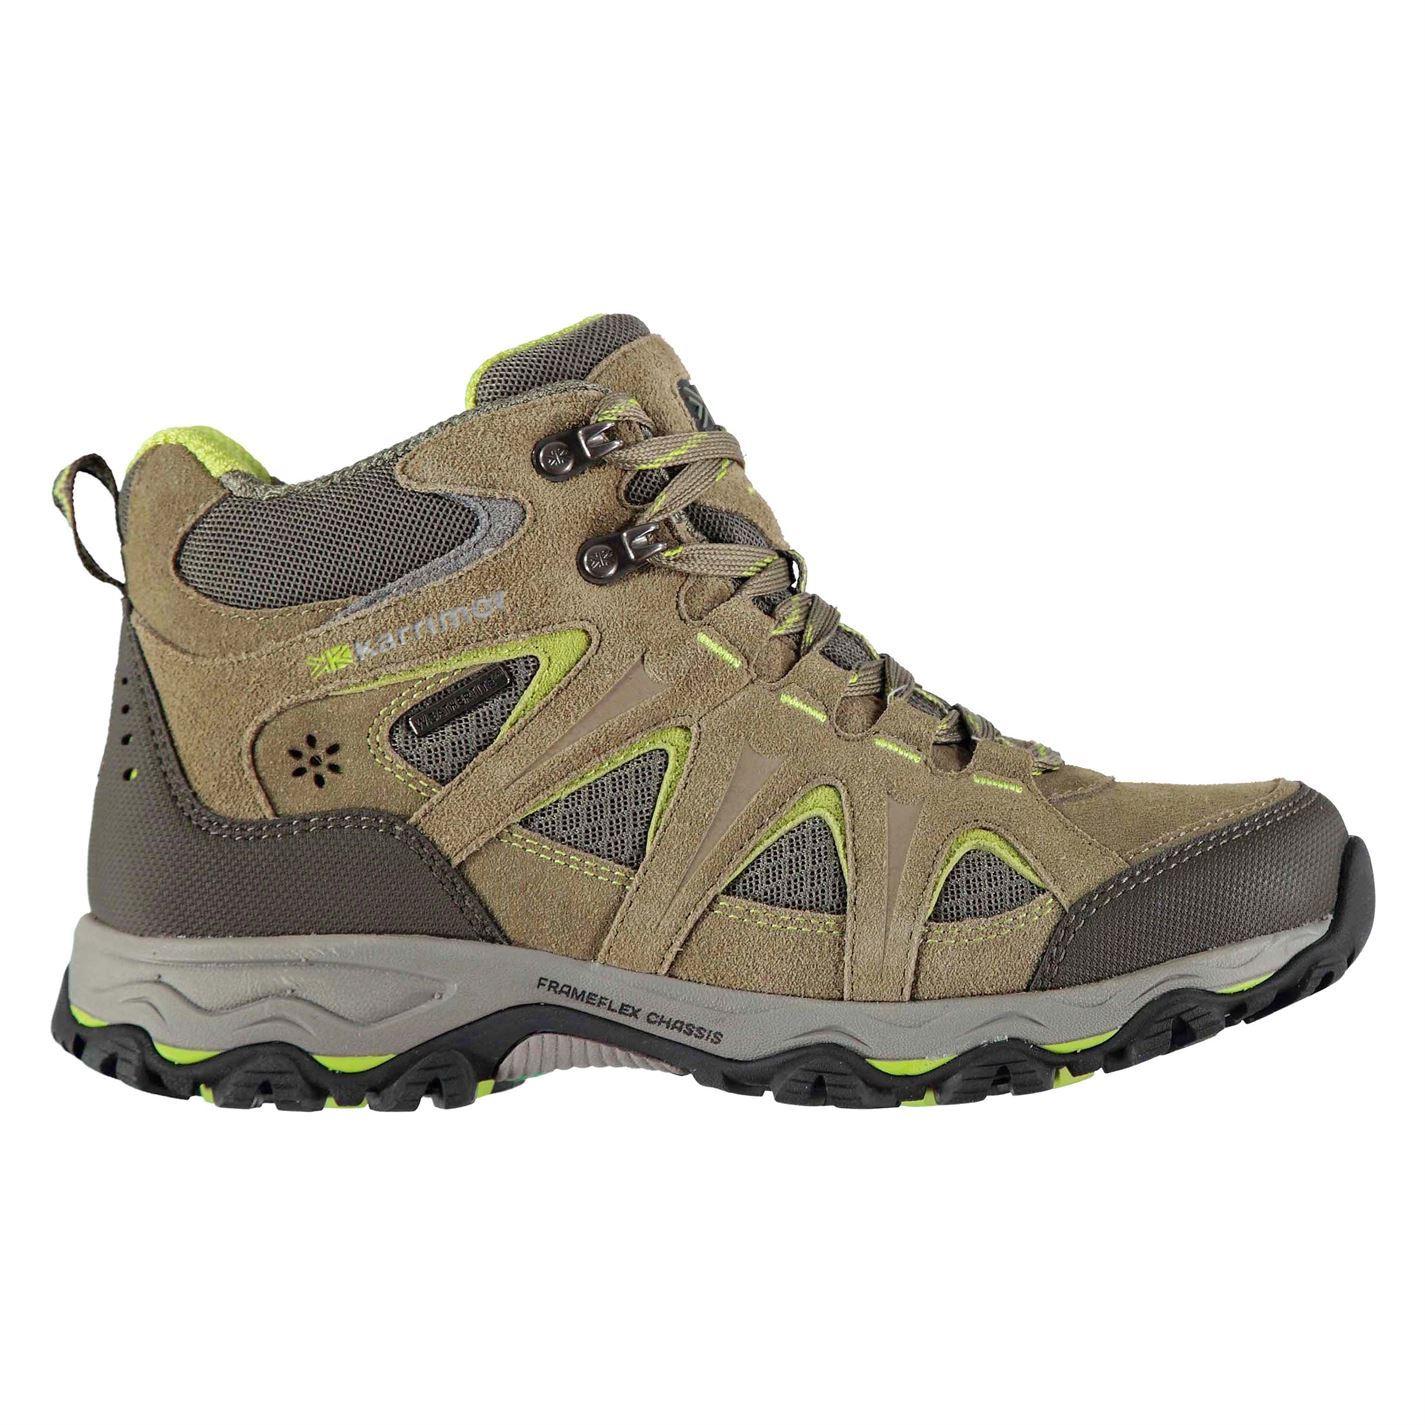 Details about Karrimor Mountain WeatherTite Mid Walking Boots Womens Hiking Trekking Shoes